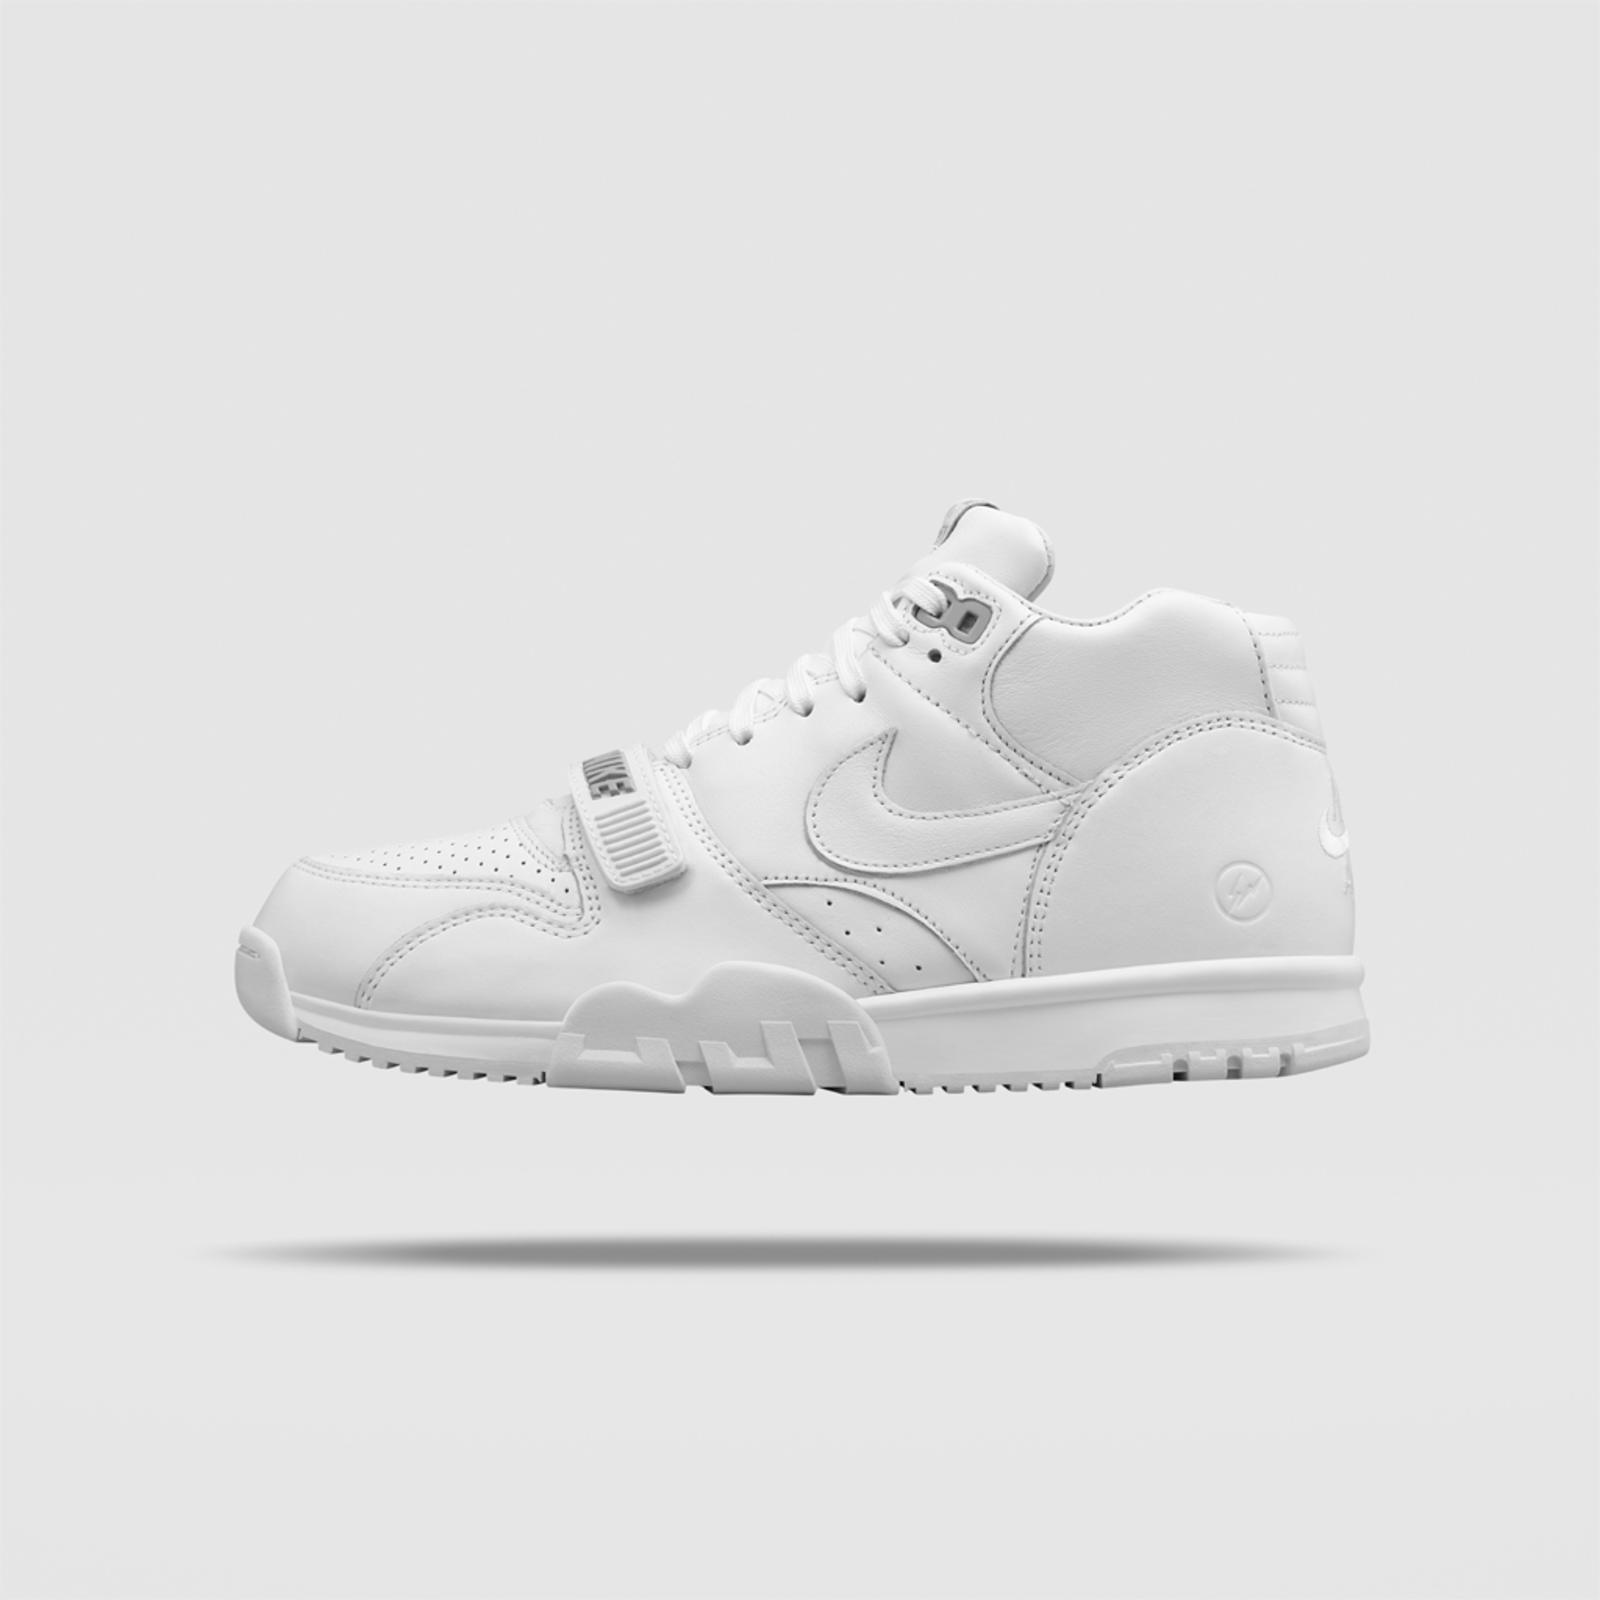 san francisco 0154f 21a06 ... Nike Air Trainer 1. Float-806942 441 F PREM.  Instagram-Float-806942 110 99 PREM